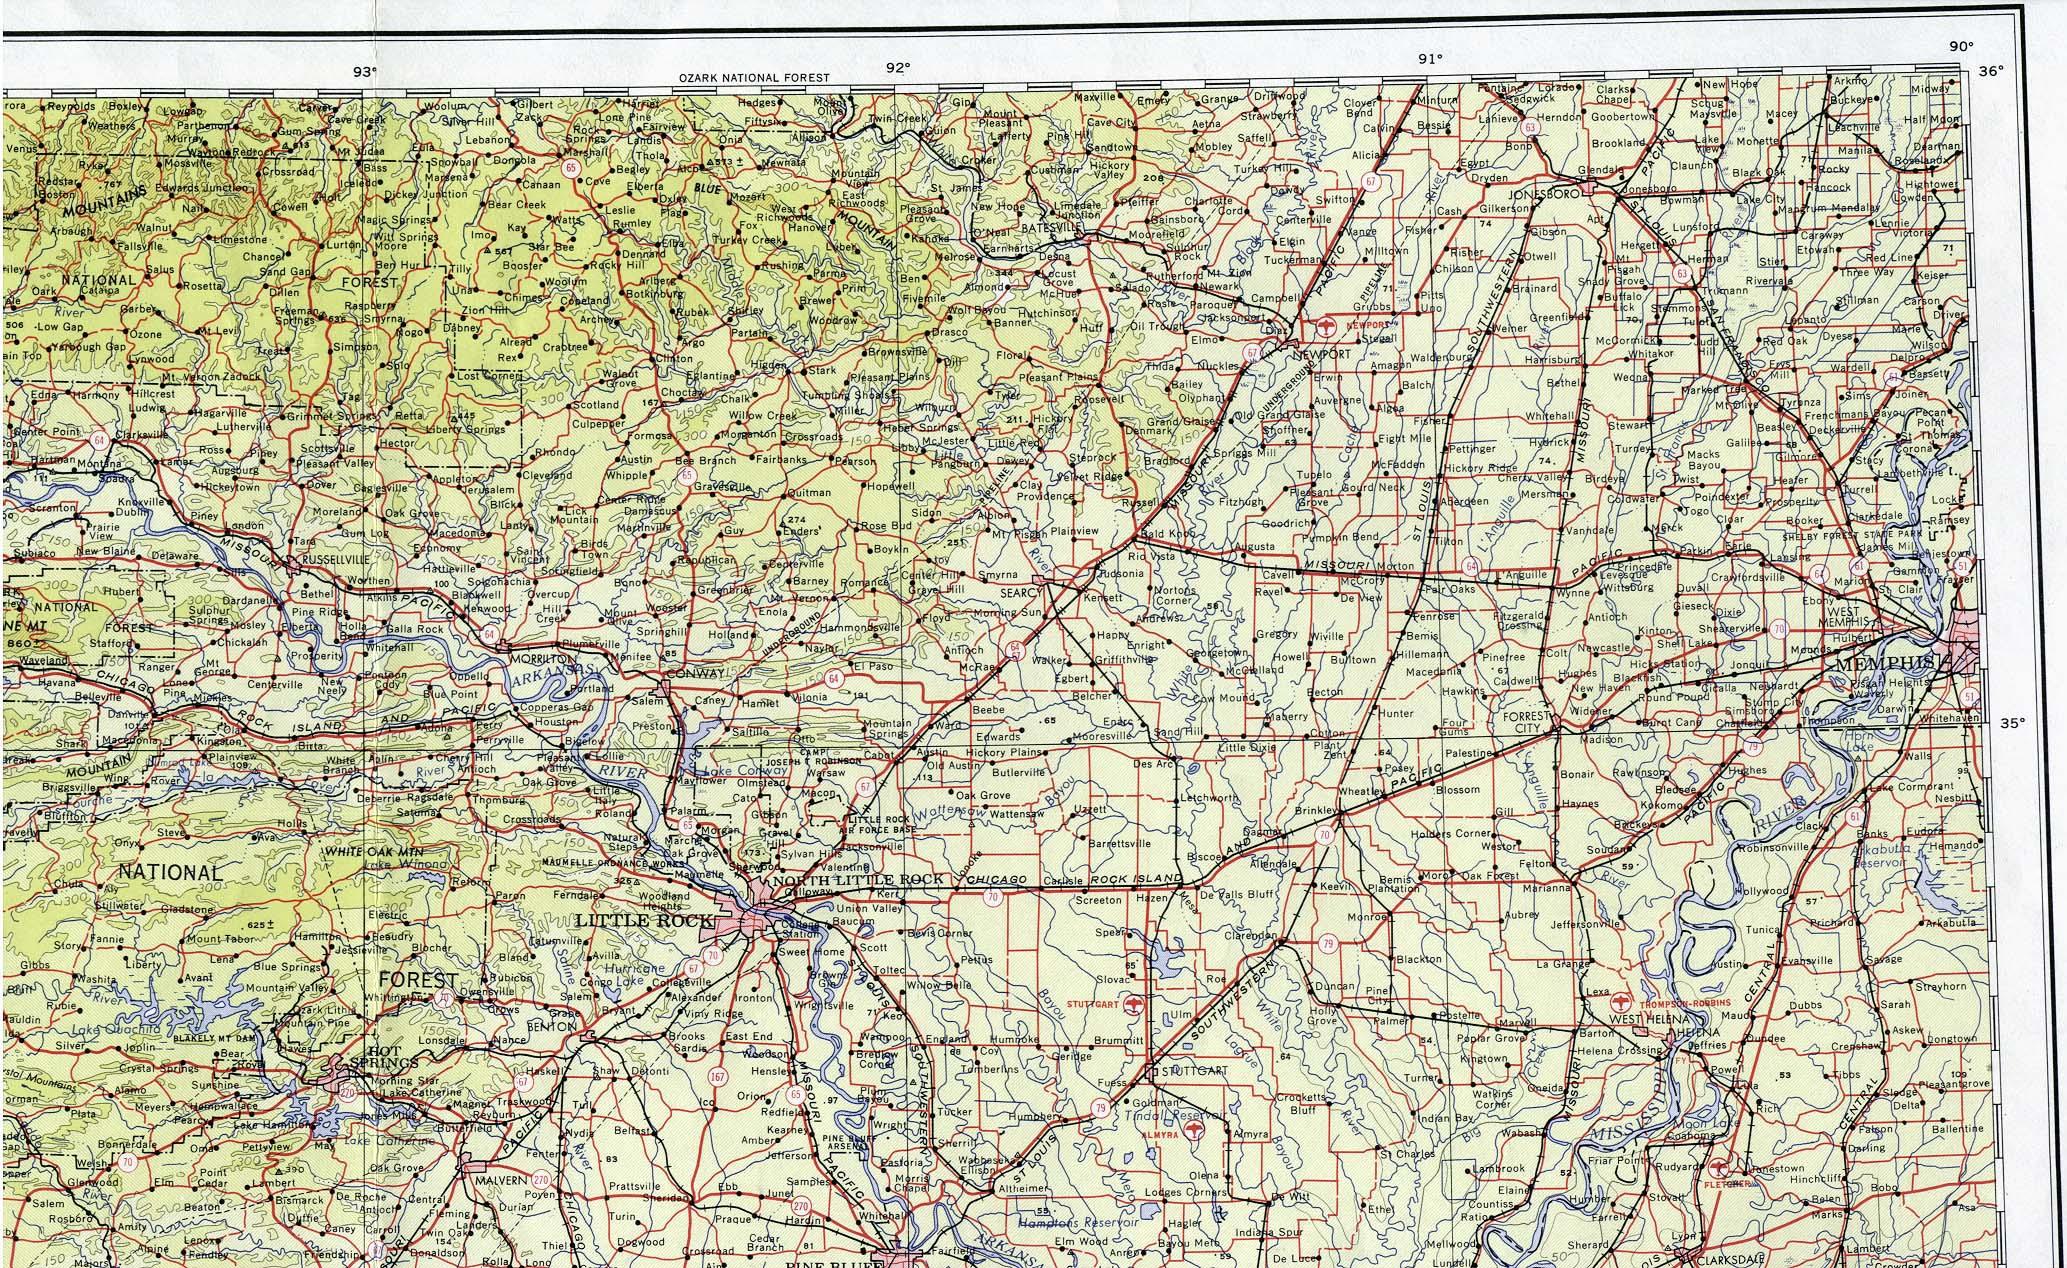 Arkansas Maps - Perry-Castañeda Map Collection - Ut Library Online - Texas Arkansas Map